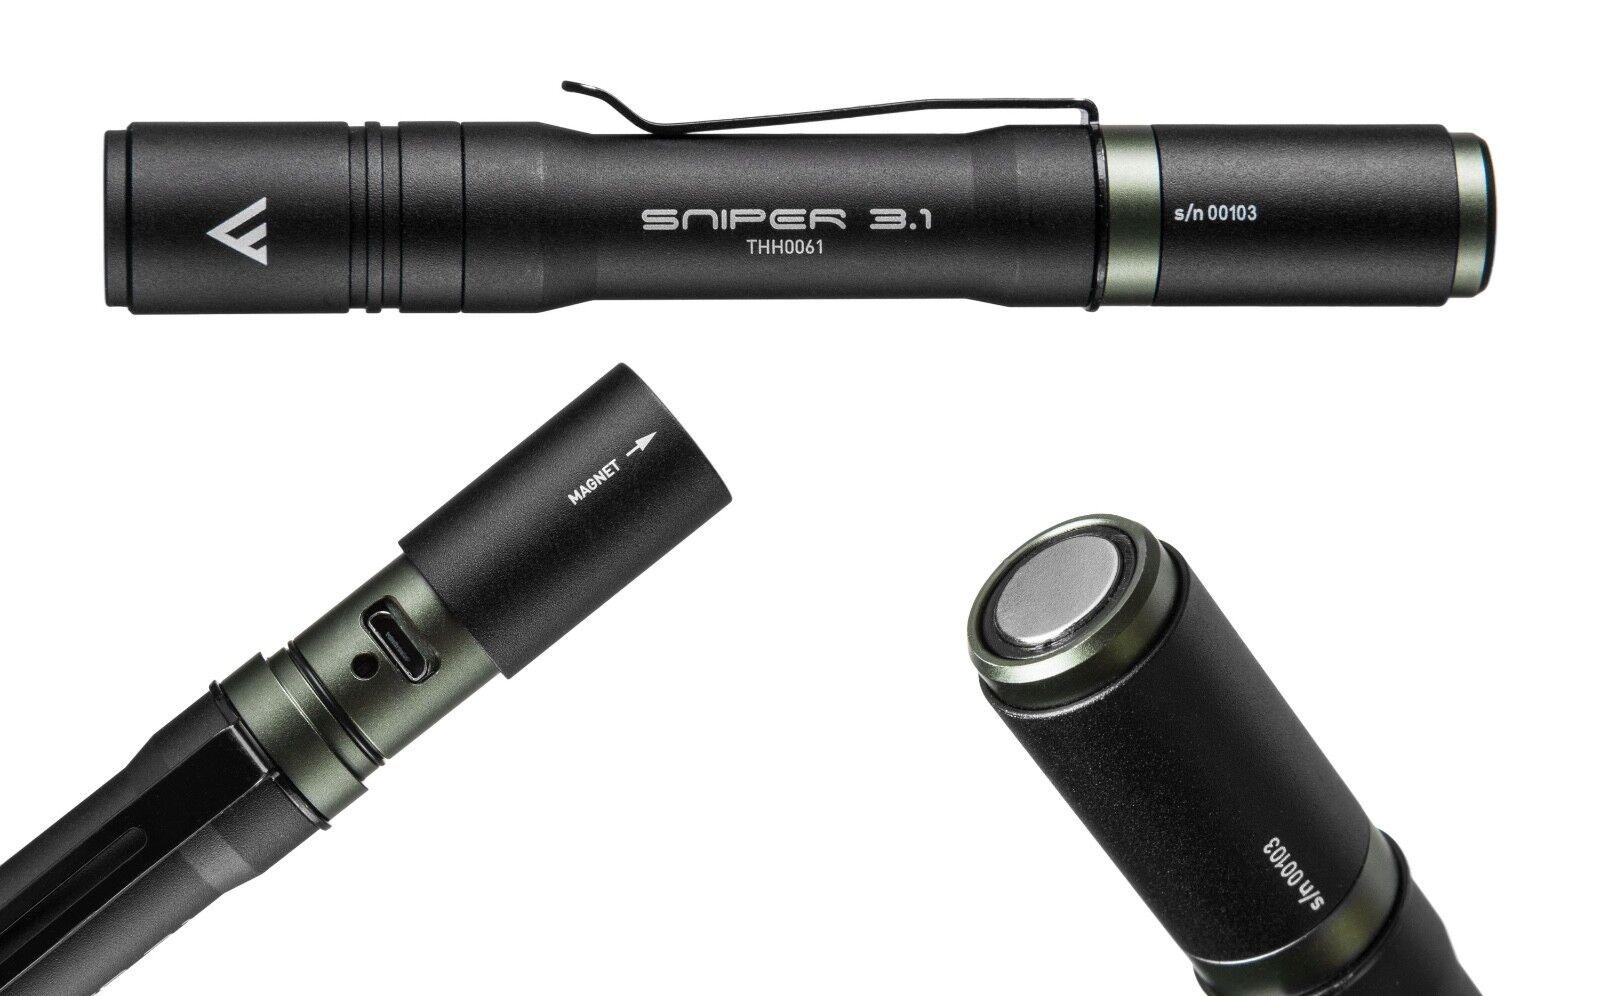 Mactronic Akku LED Taschenlampe 130 Lumen Sniper 3.1 3.1 3.1  | Primäre Qualität  53e195